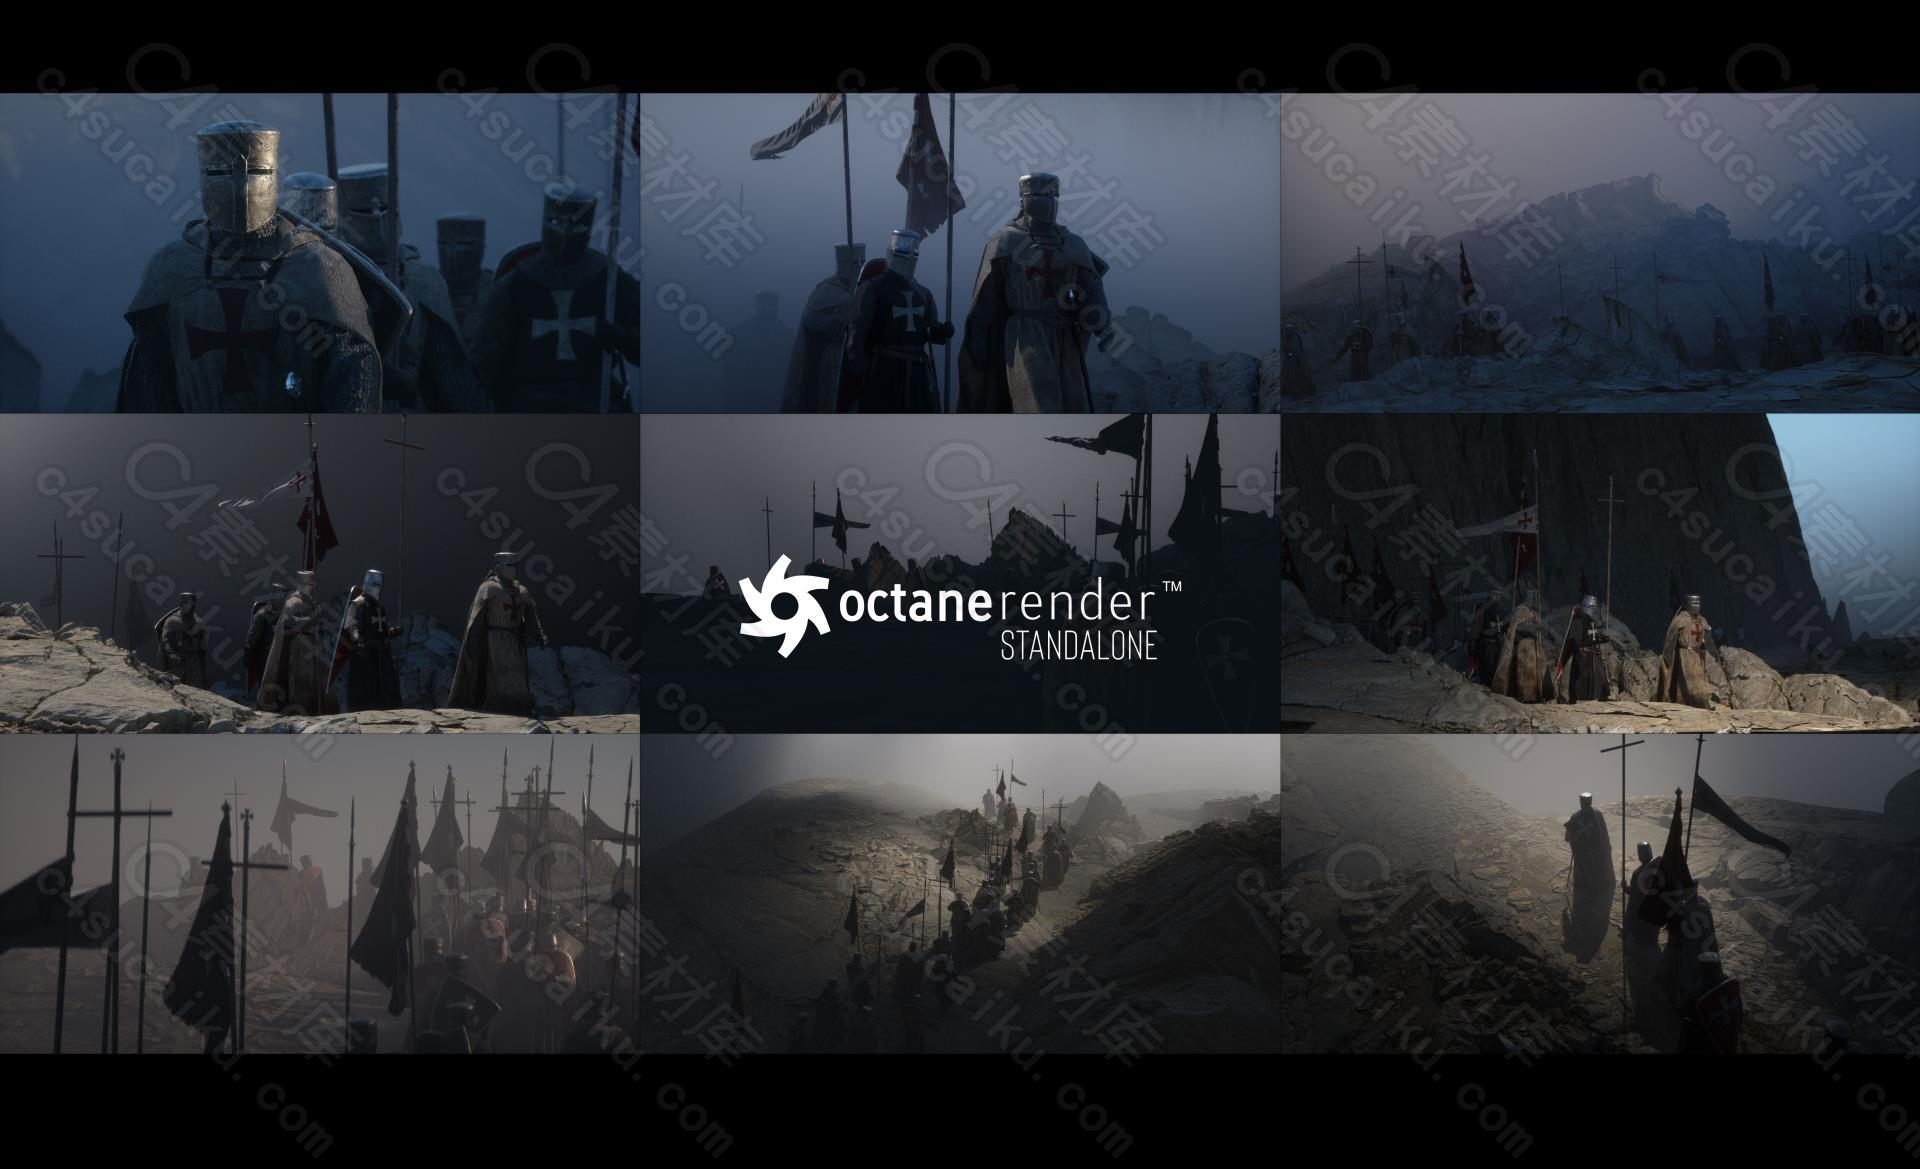 C4素材网-中世纪风十字军Octane Render渲染技术核心技能训练视频教程